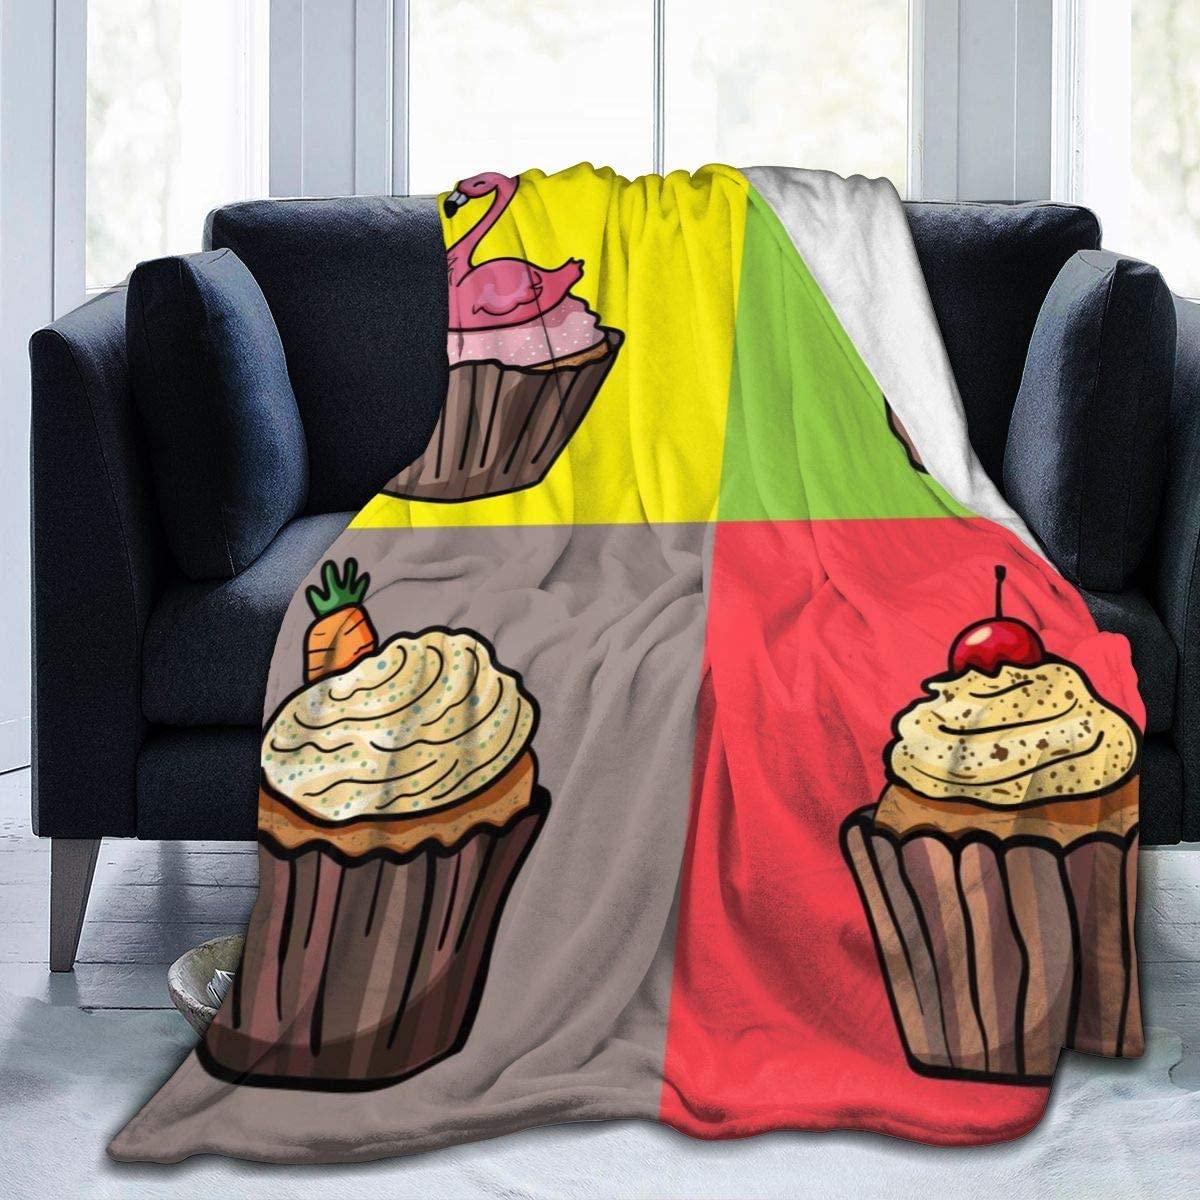 Micro Fleece Plush Soft Baby Blanket Cartoon Cute Cupcakes Fluffy Warm Toddler Bed/Crib Blanket Lightweight Flannel Daycare Nap Kids Sleeping Tummy Time Throw Blanket Girls Boy Clearance Kid/Baby